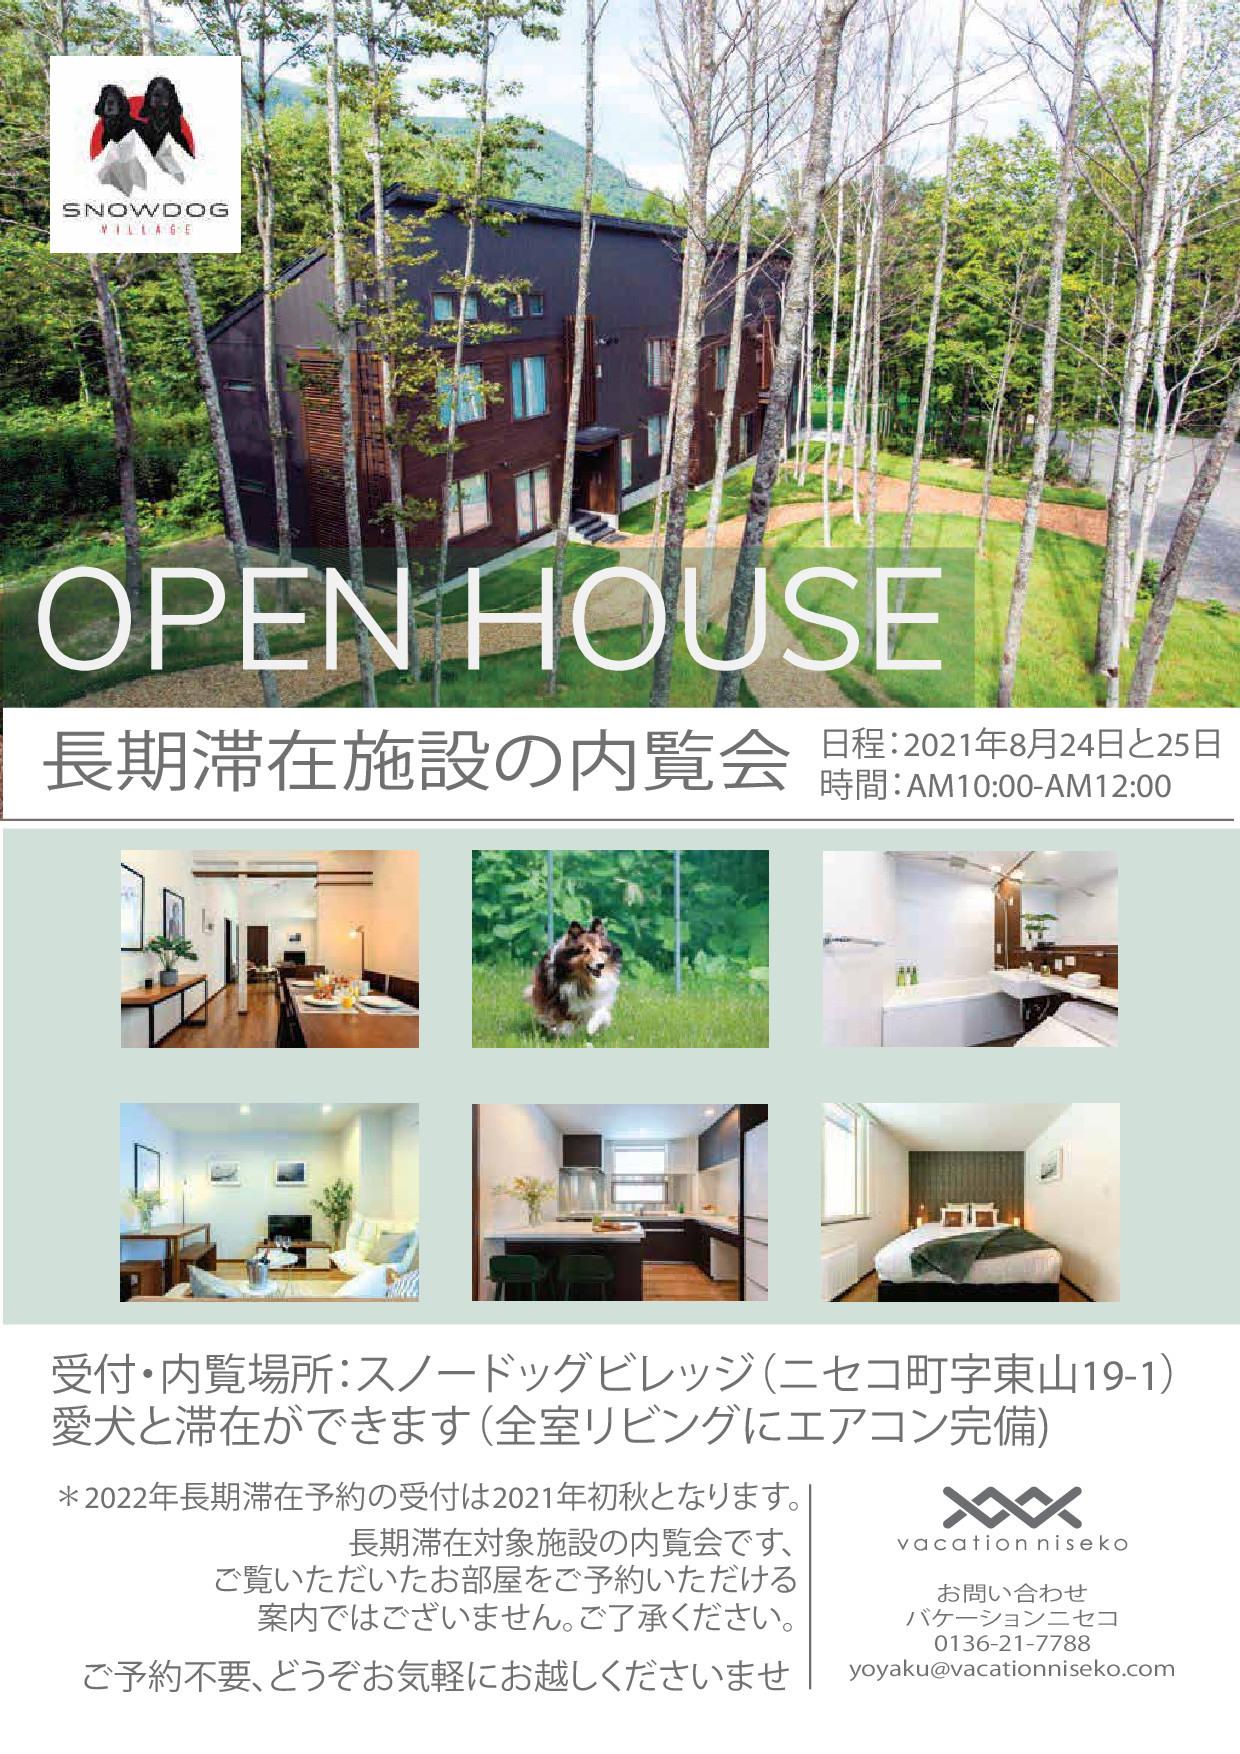 Open House SDV